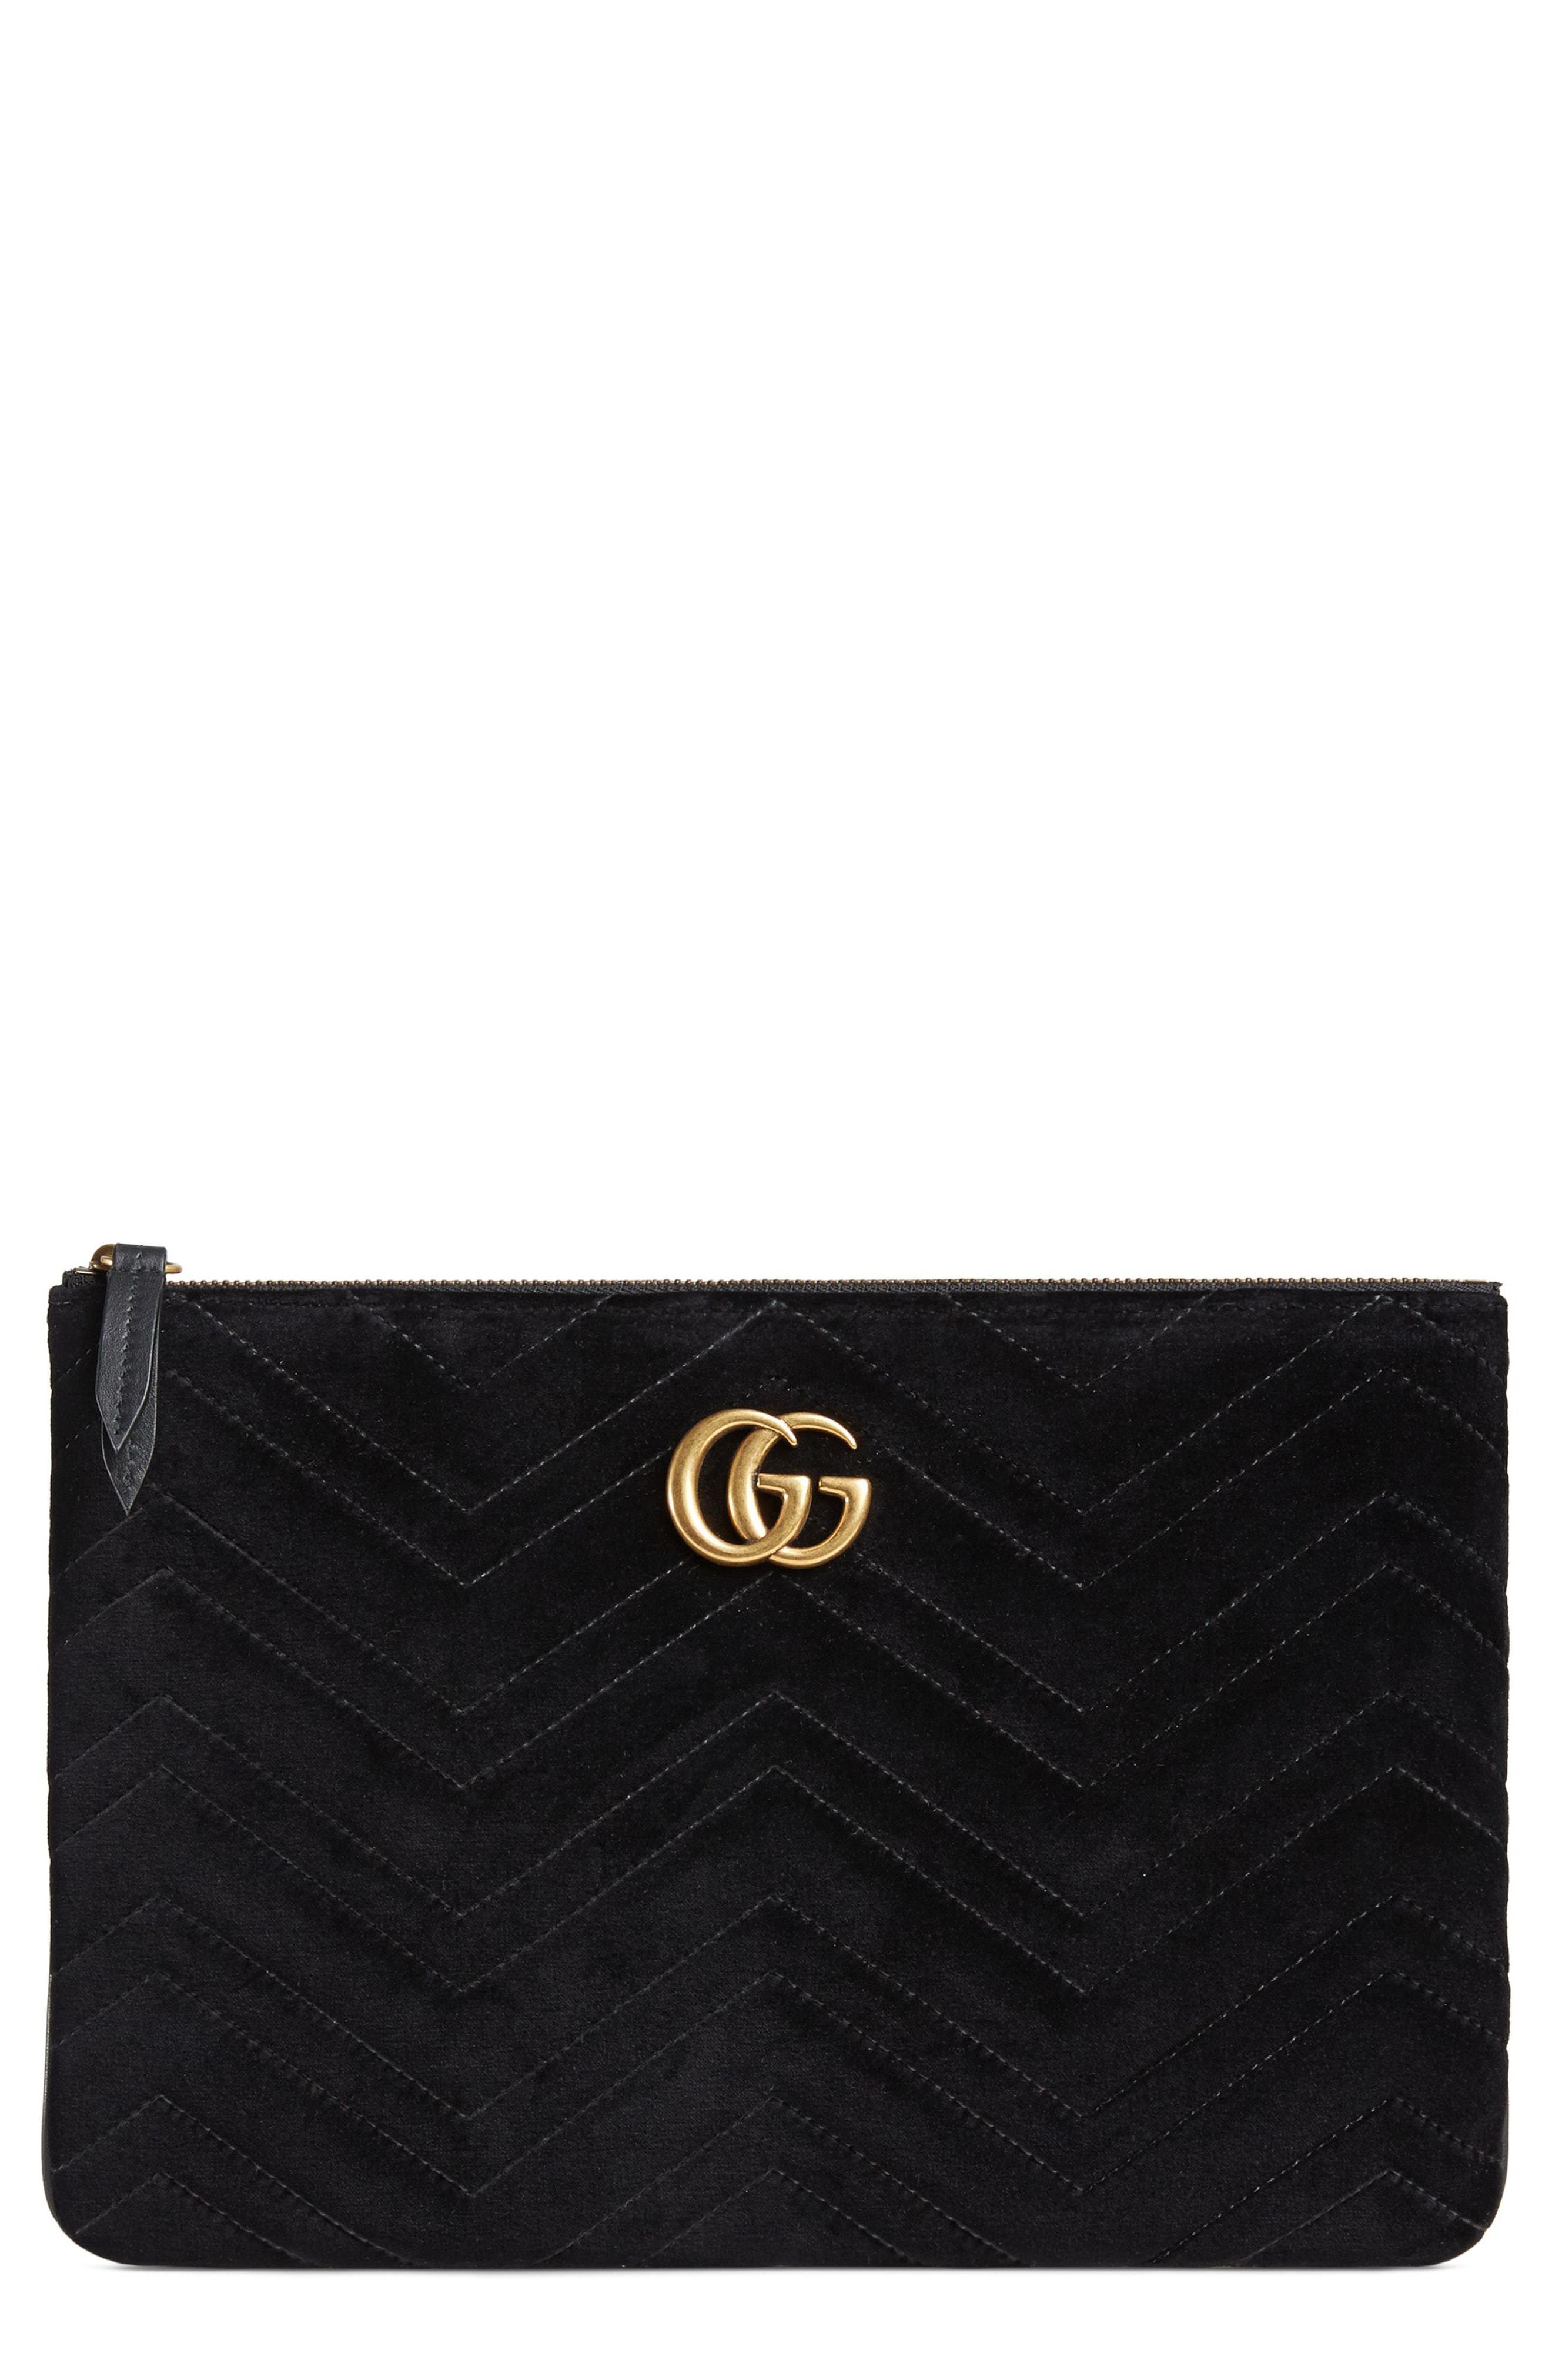 Gucci Gg Marmont 20 Matelasse Velvet Pouch